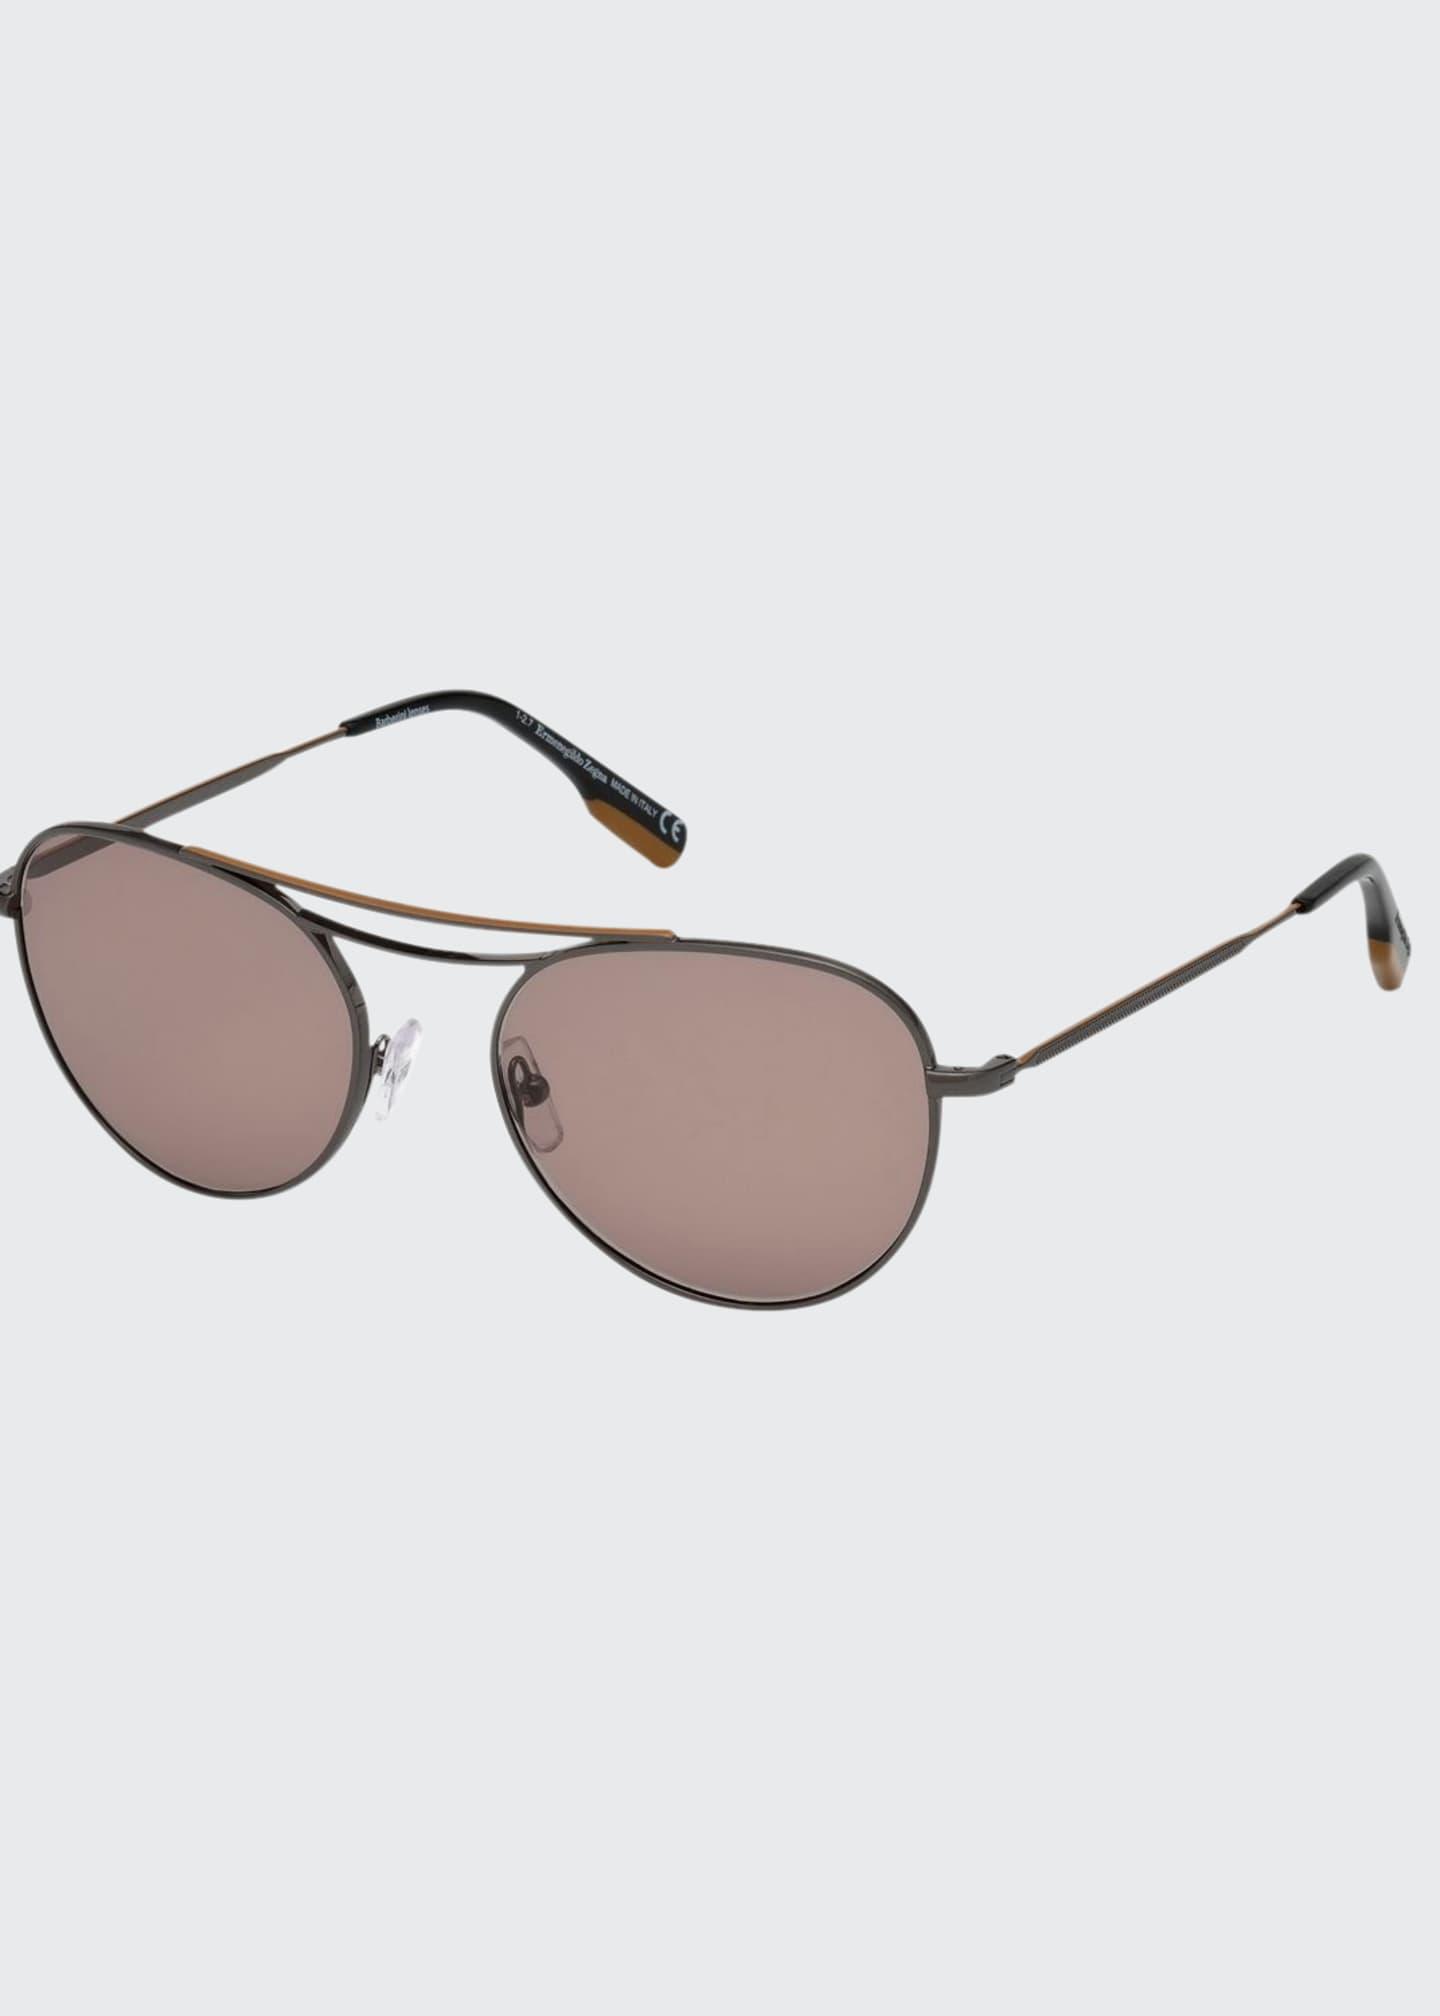 Ermenegildo Zegna Men's Two-Tone Metal Aviator Sunglasses